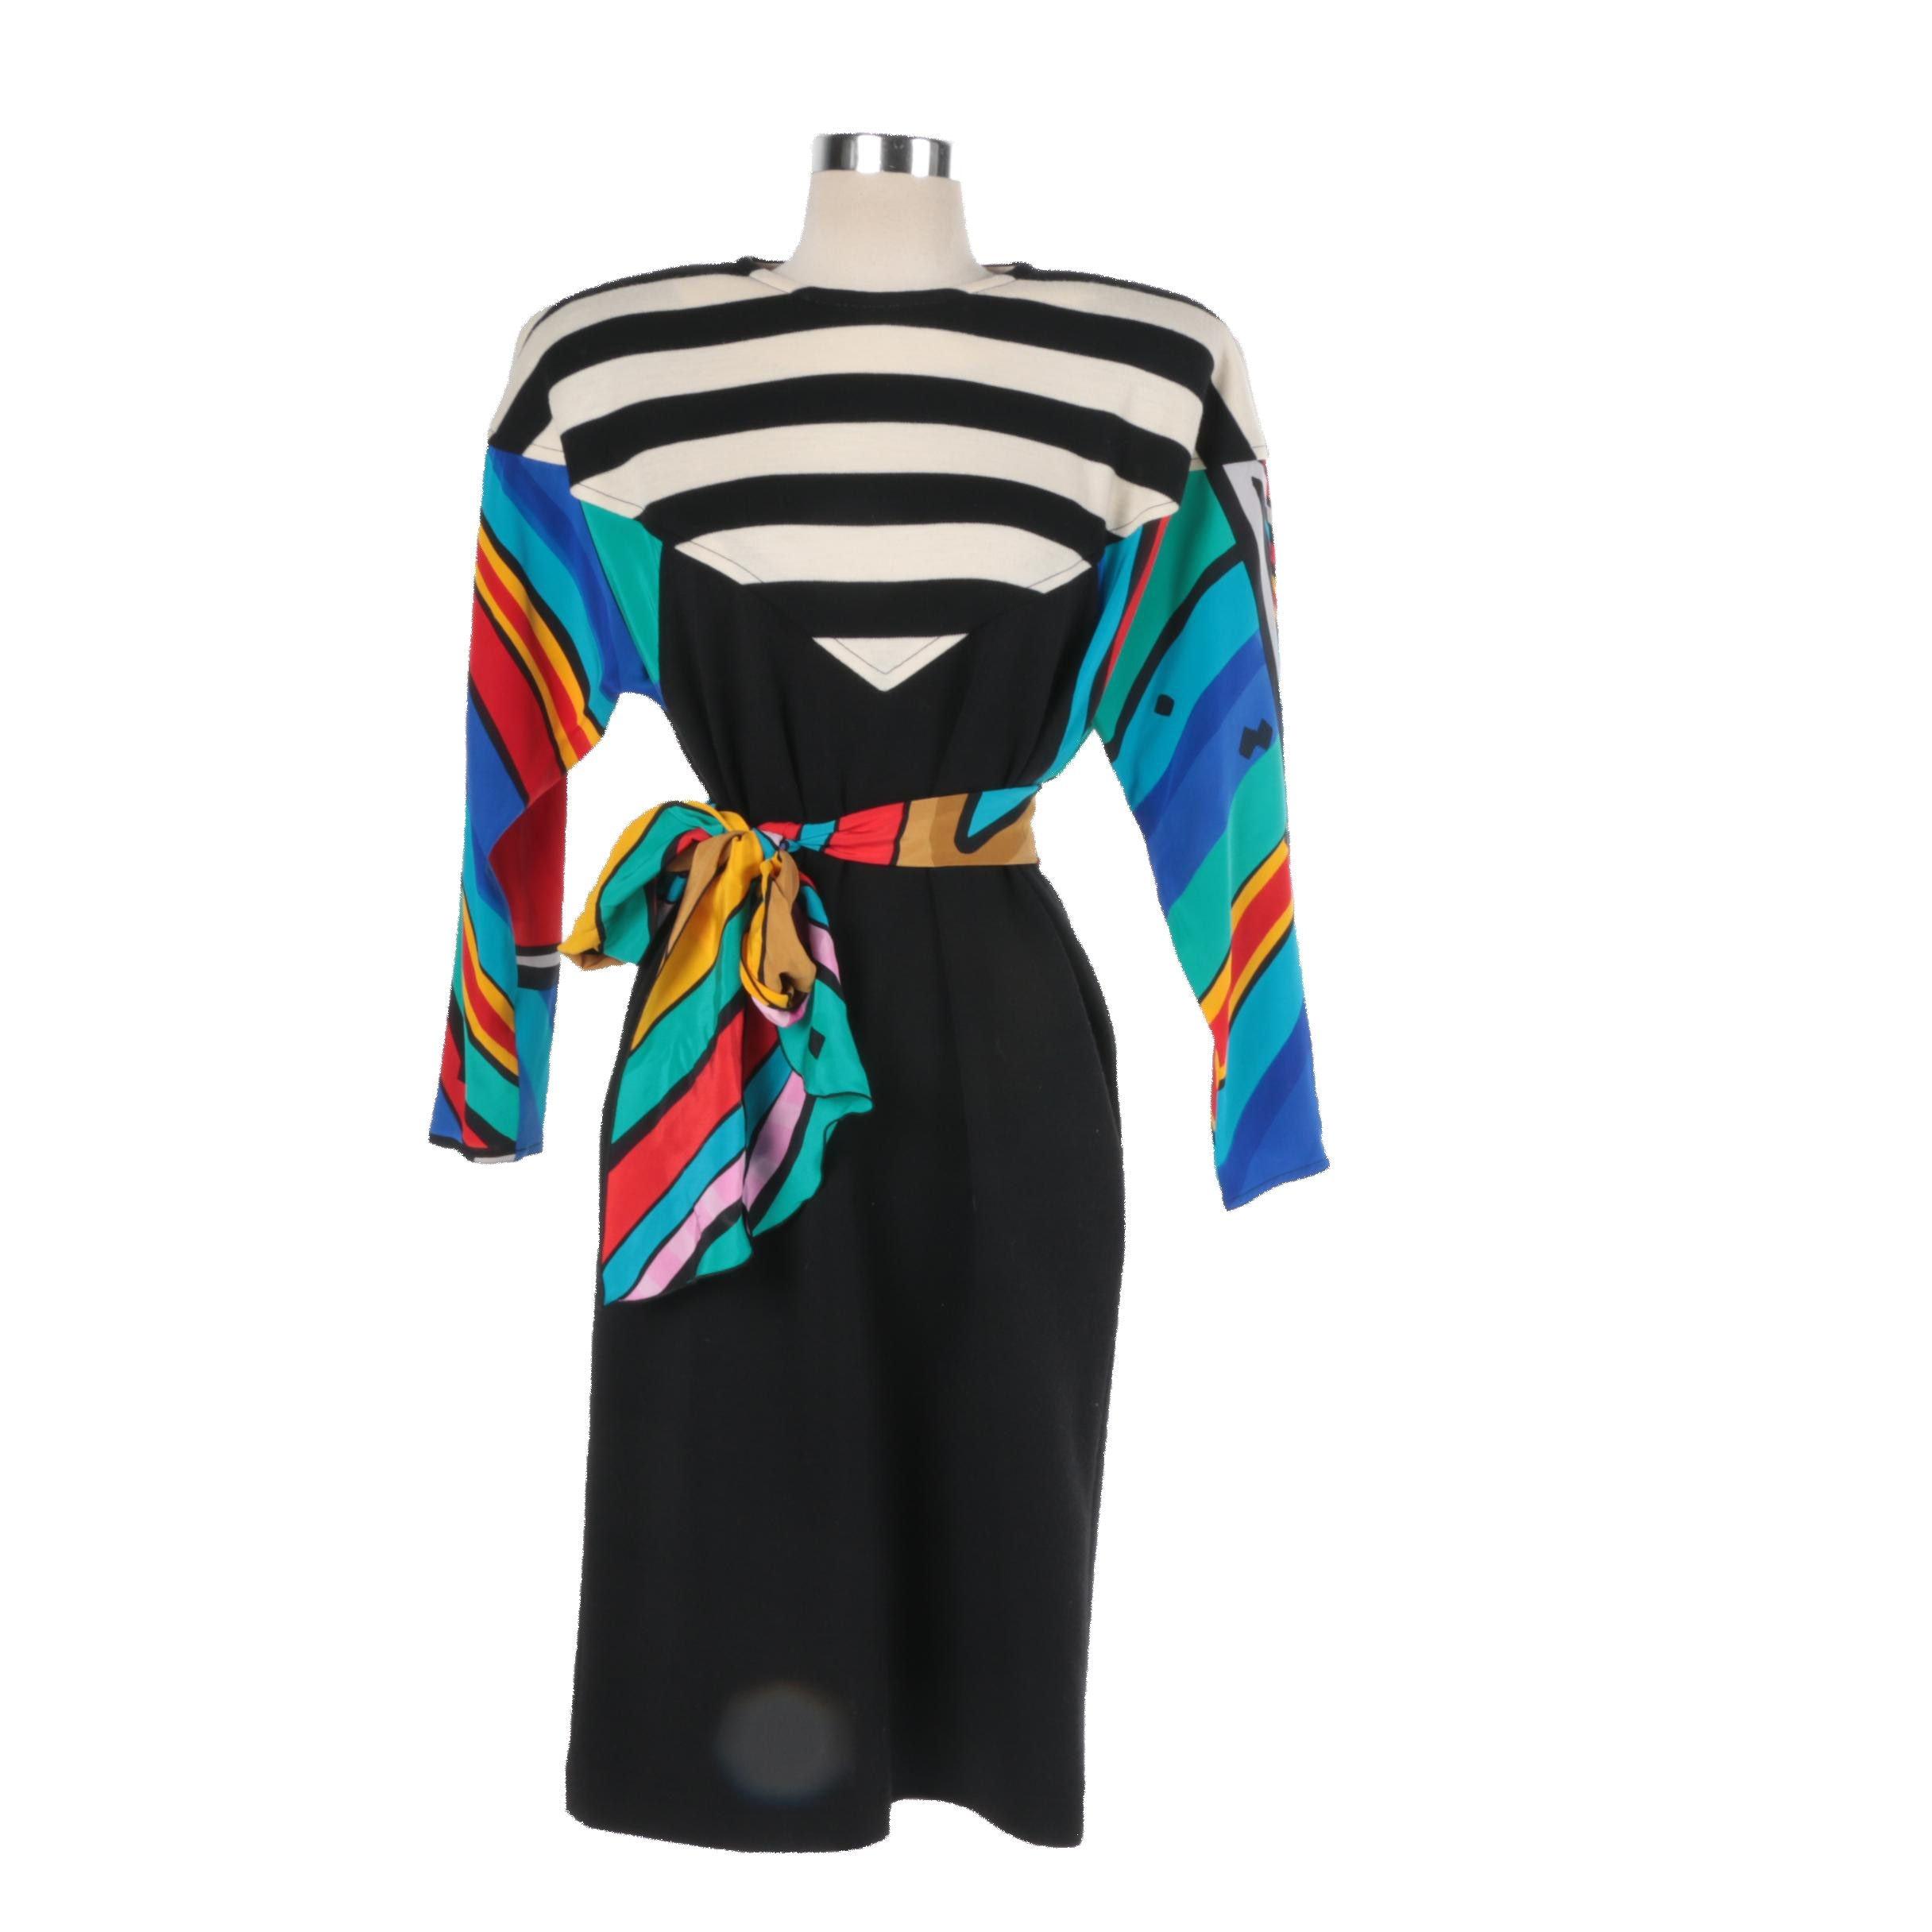 Circa 1980s Yolanda Lorente Mixed Print Wool Dress